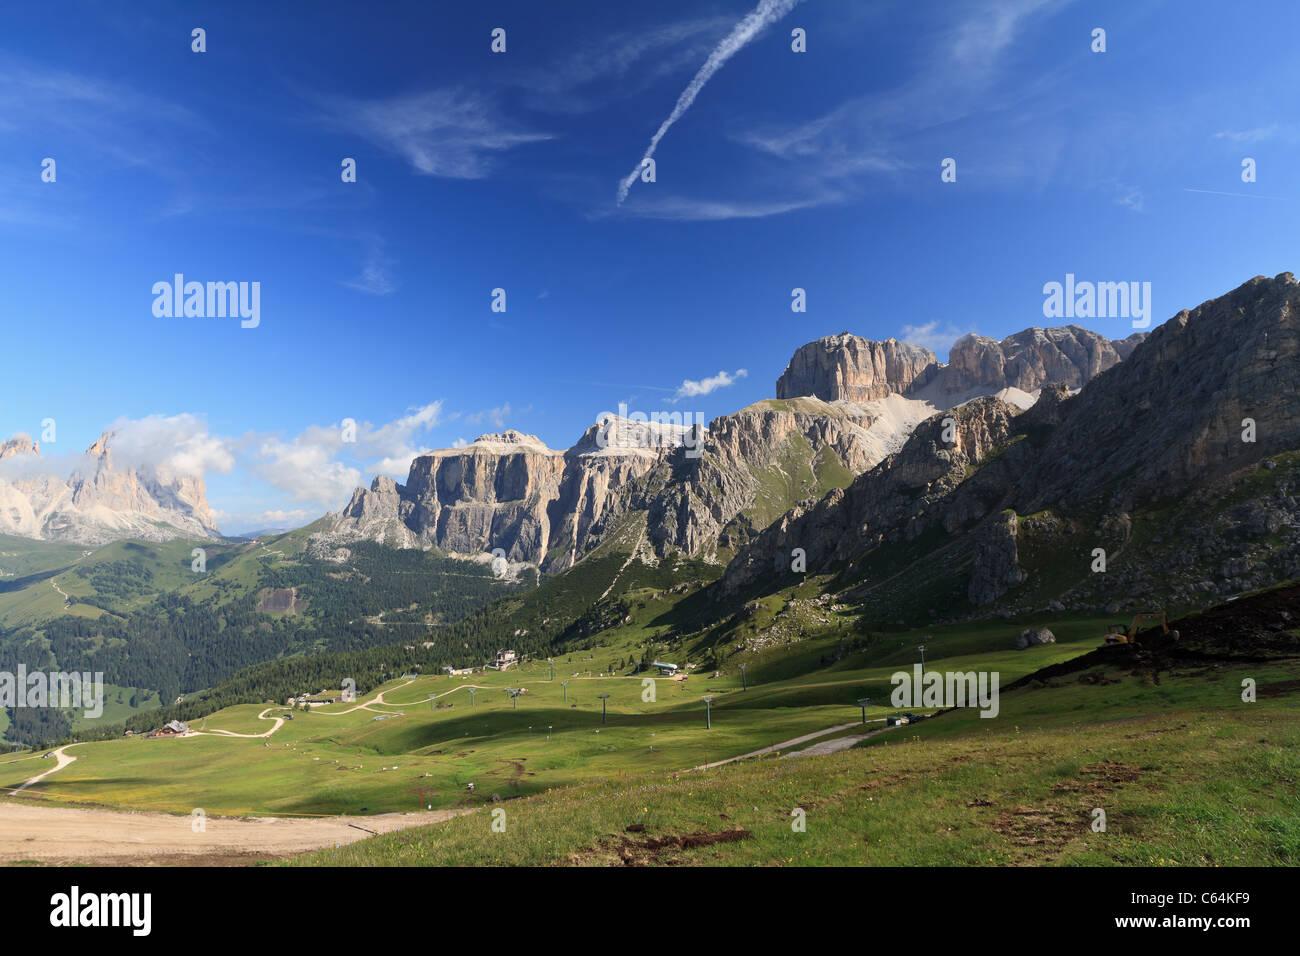 summer view of Italian Dolomites in Fassa Valley with Saas Pordoi and Sassolungo mountain - Stock Image